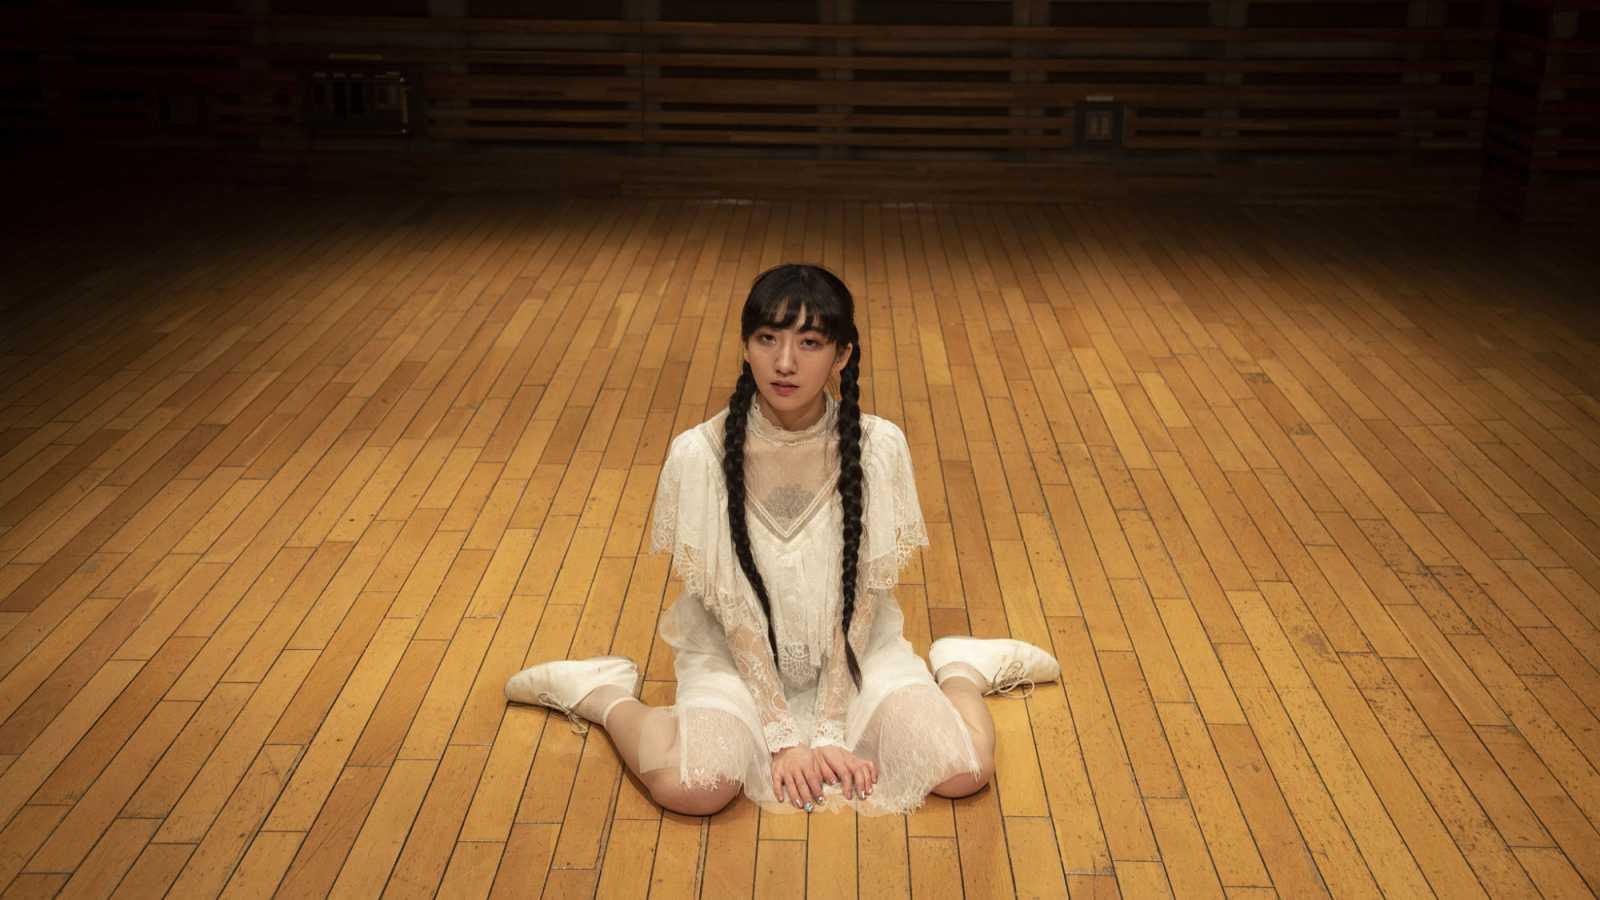 HARU NEMURI Uploads 15-Minute Performance Video and Announces No-Audience Live Stream © HARU NEMURI. All rights reserved.